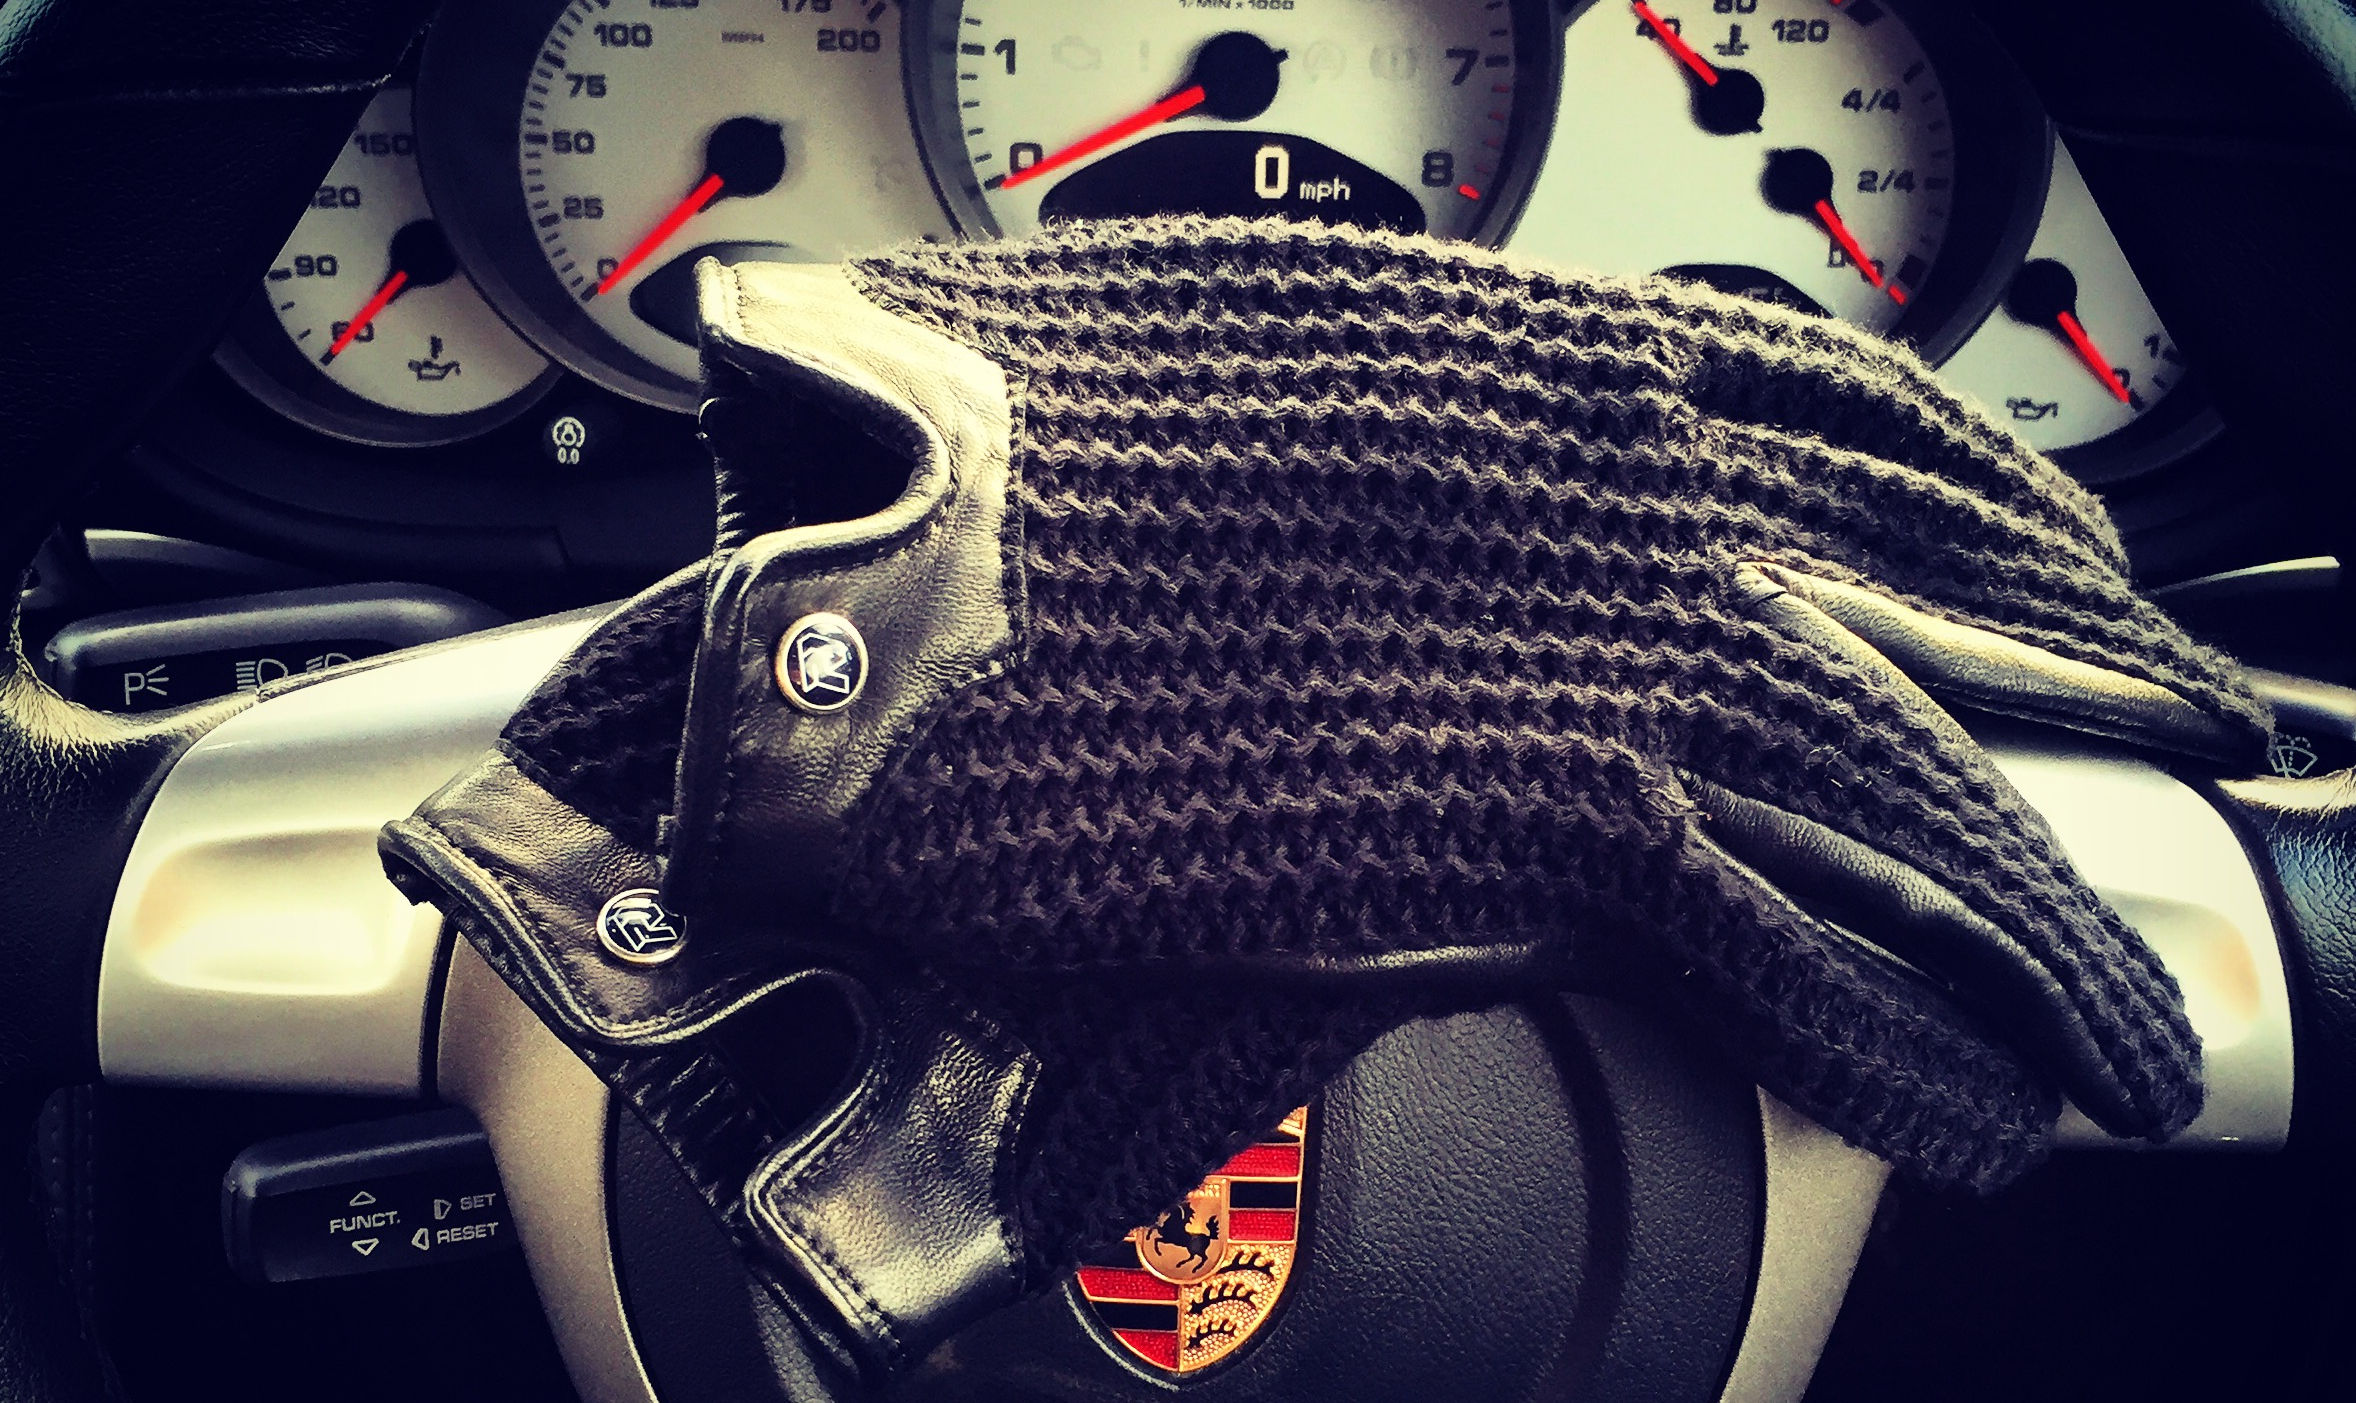 Autodromo Driving Gloves in Black